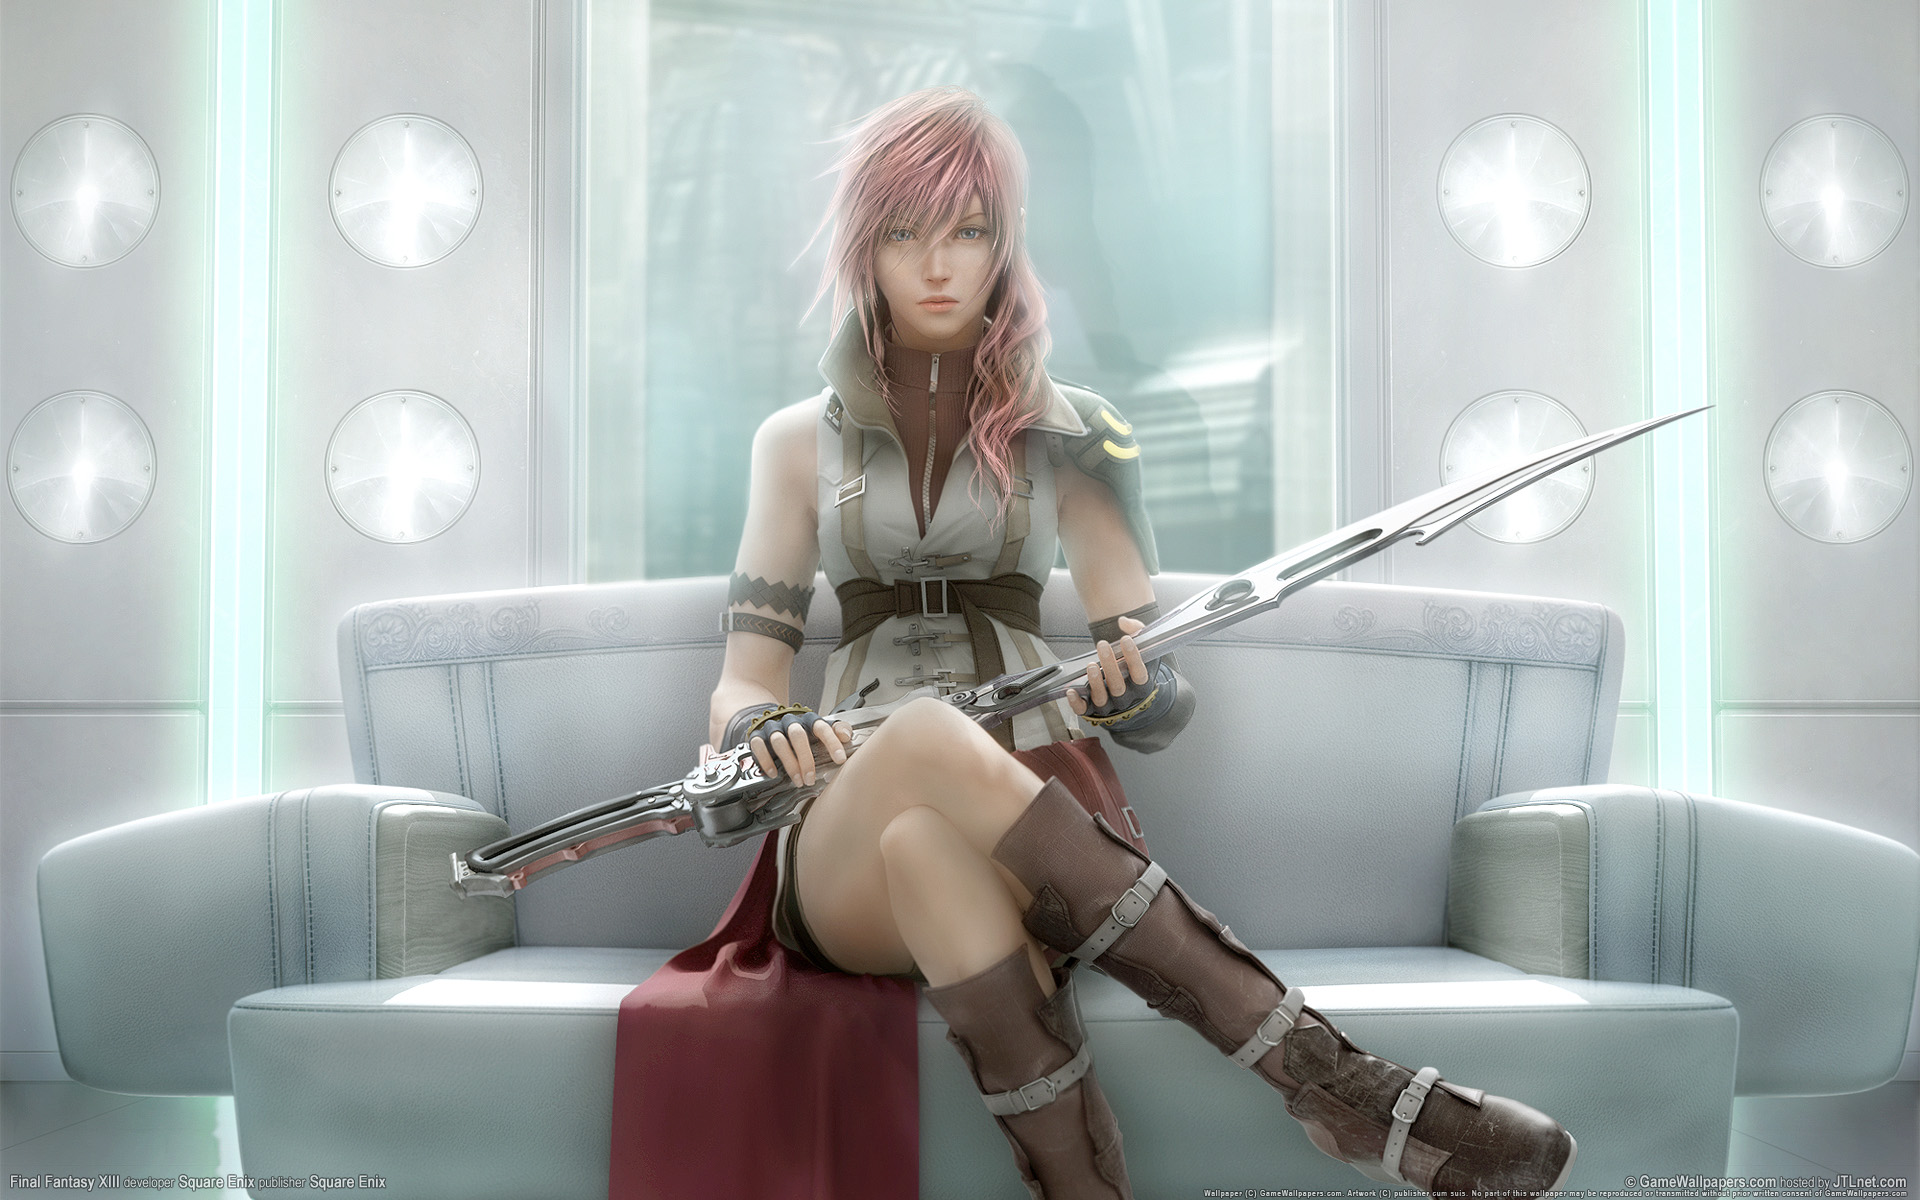 Lightning Returns: Final Fantasy XIII-3 Gets A Trailer